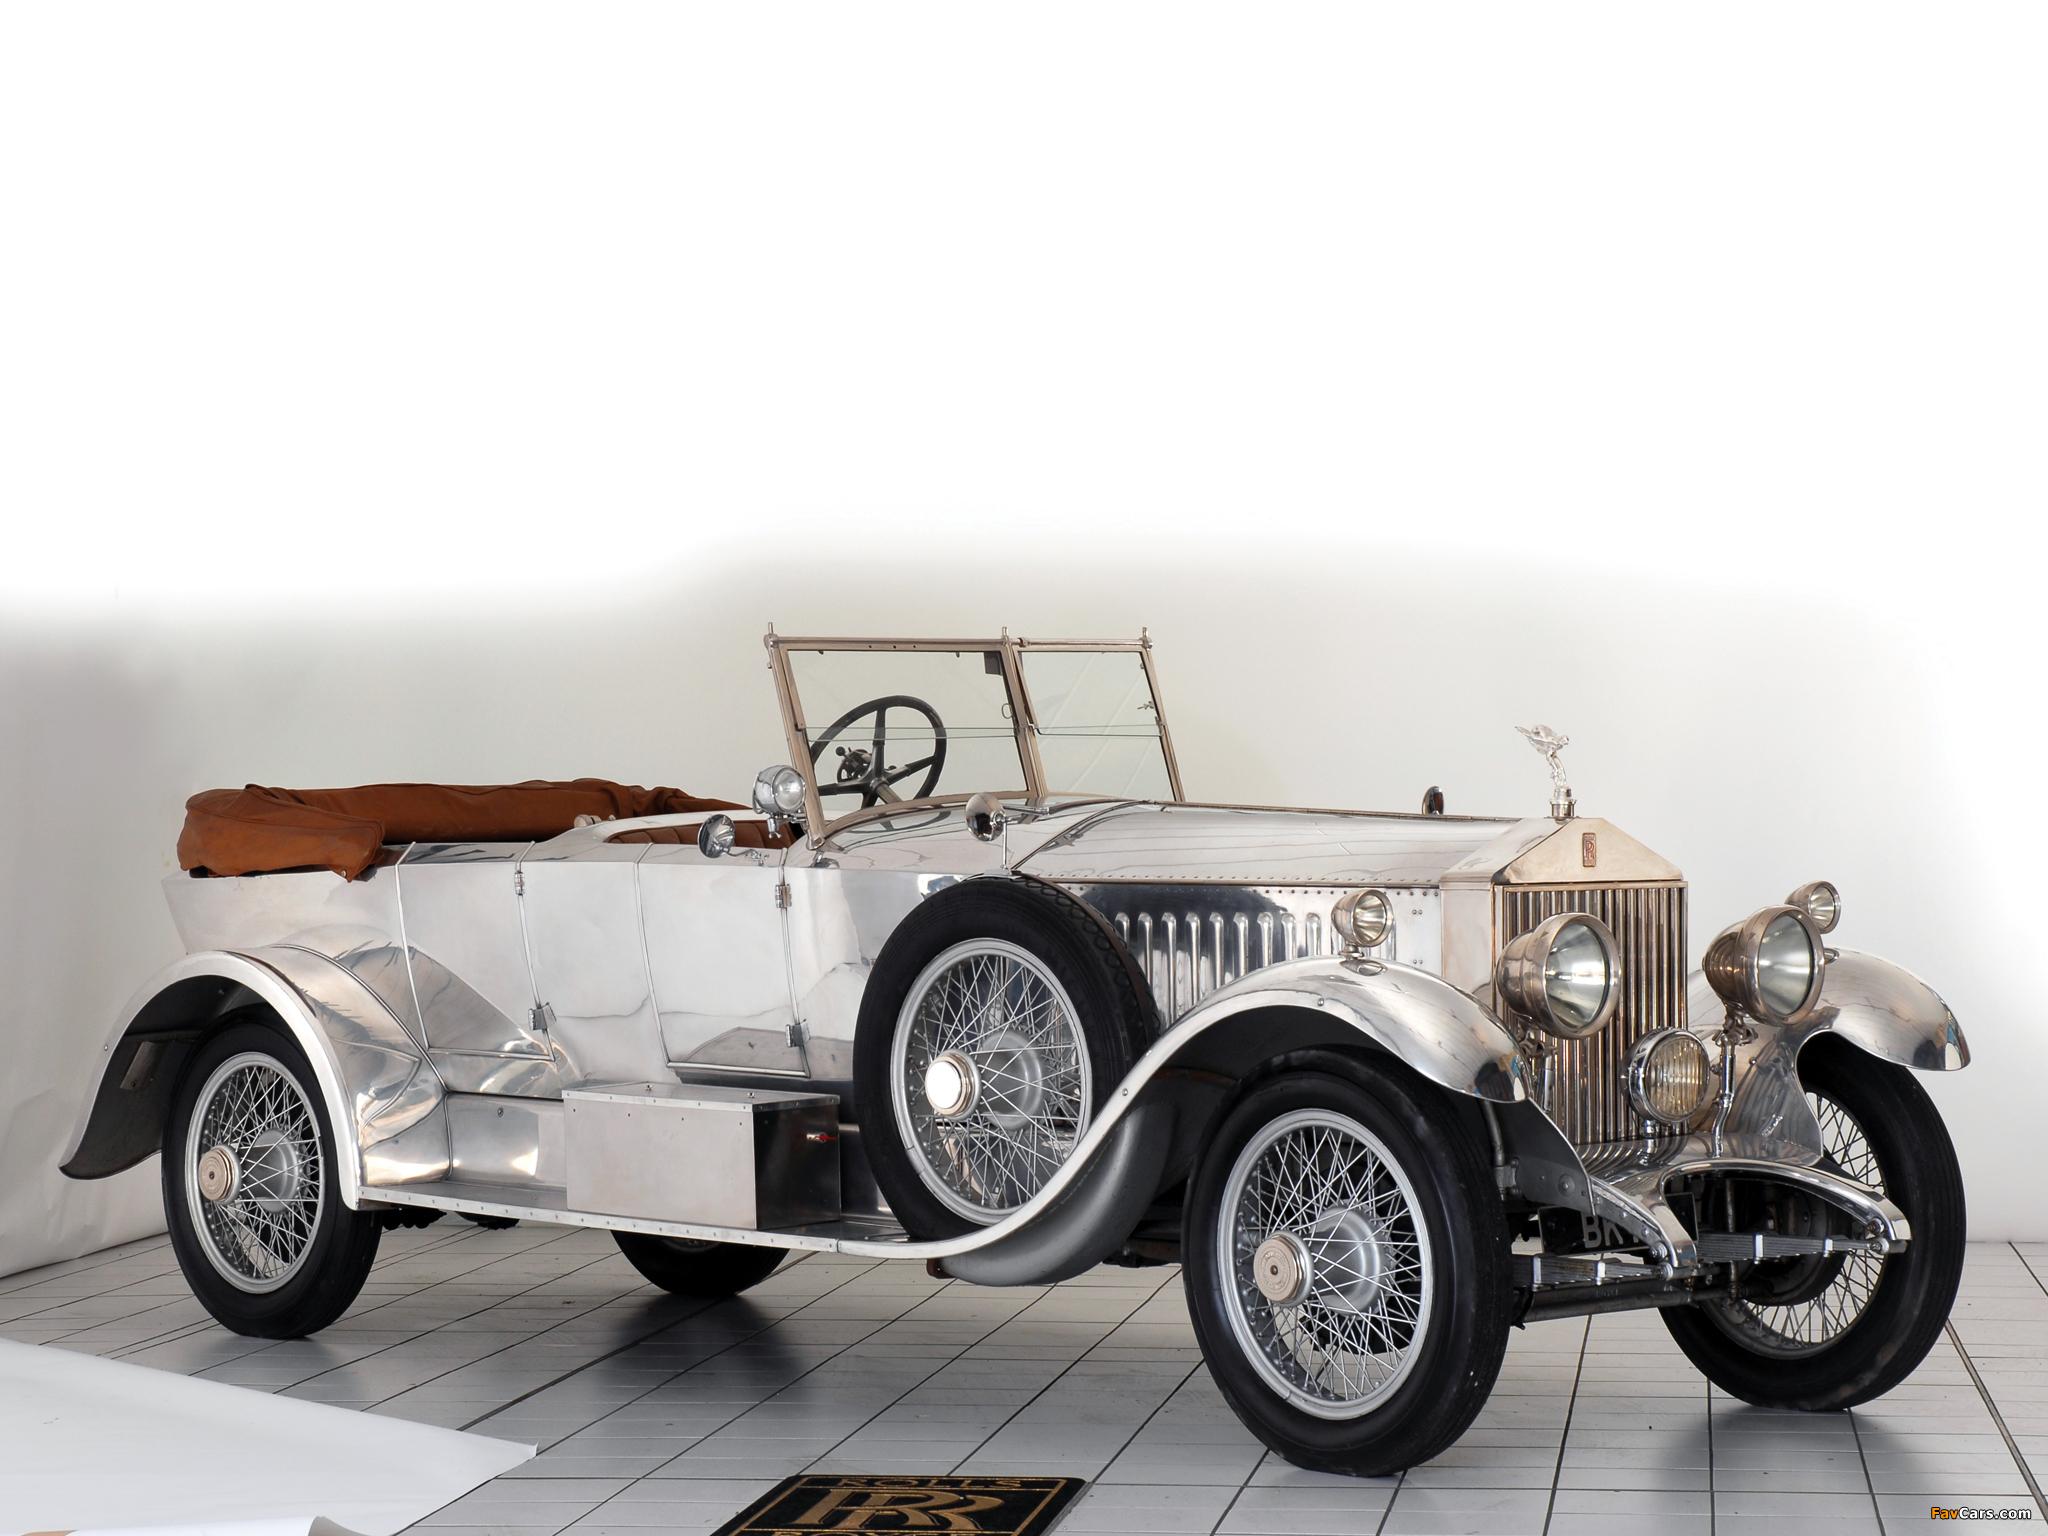 Rolls-Royce Phantom I 40/50 HP Open Tourer by Windover 1926 photos (2048 x 1536)